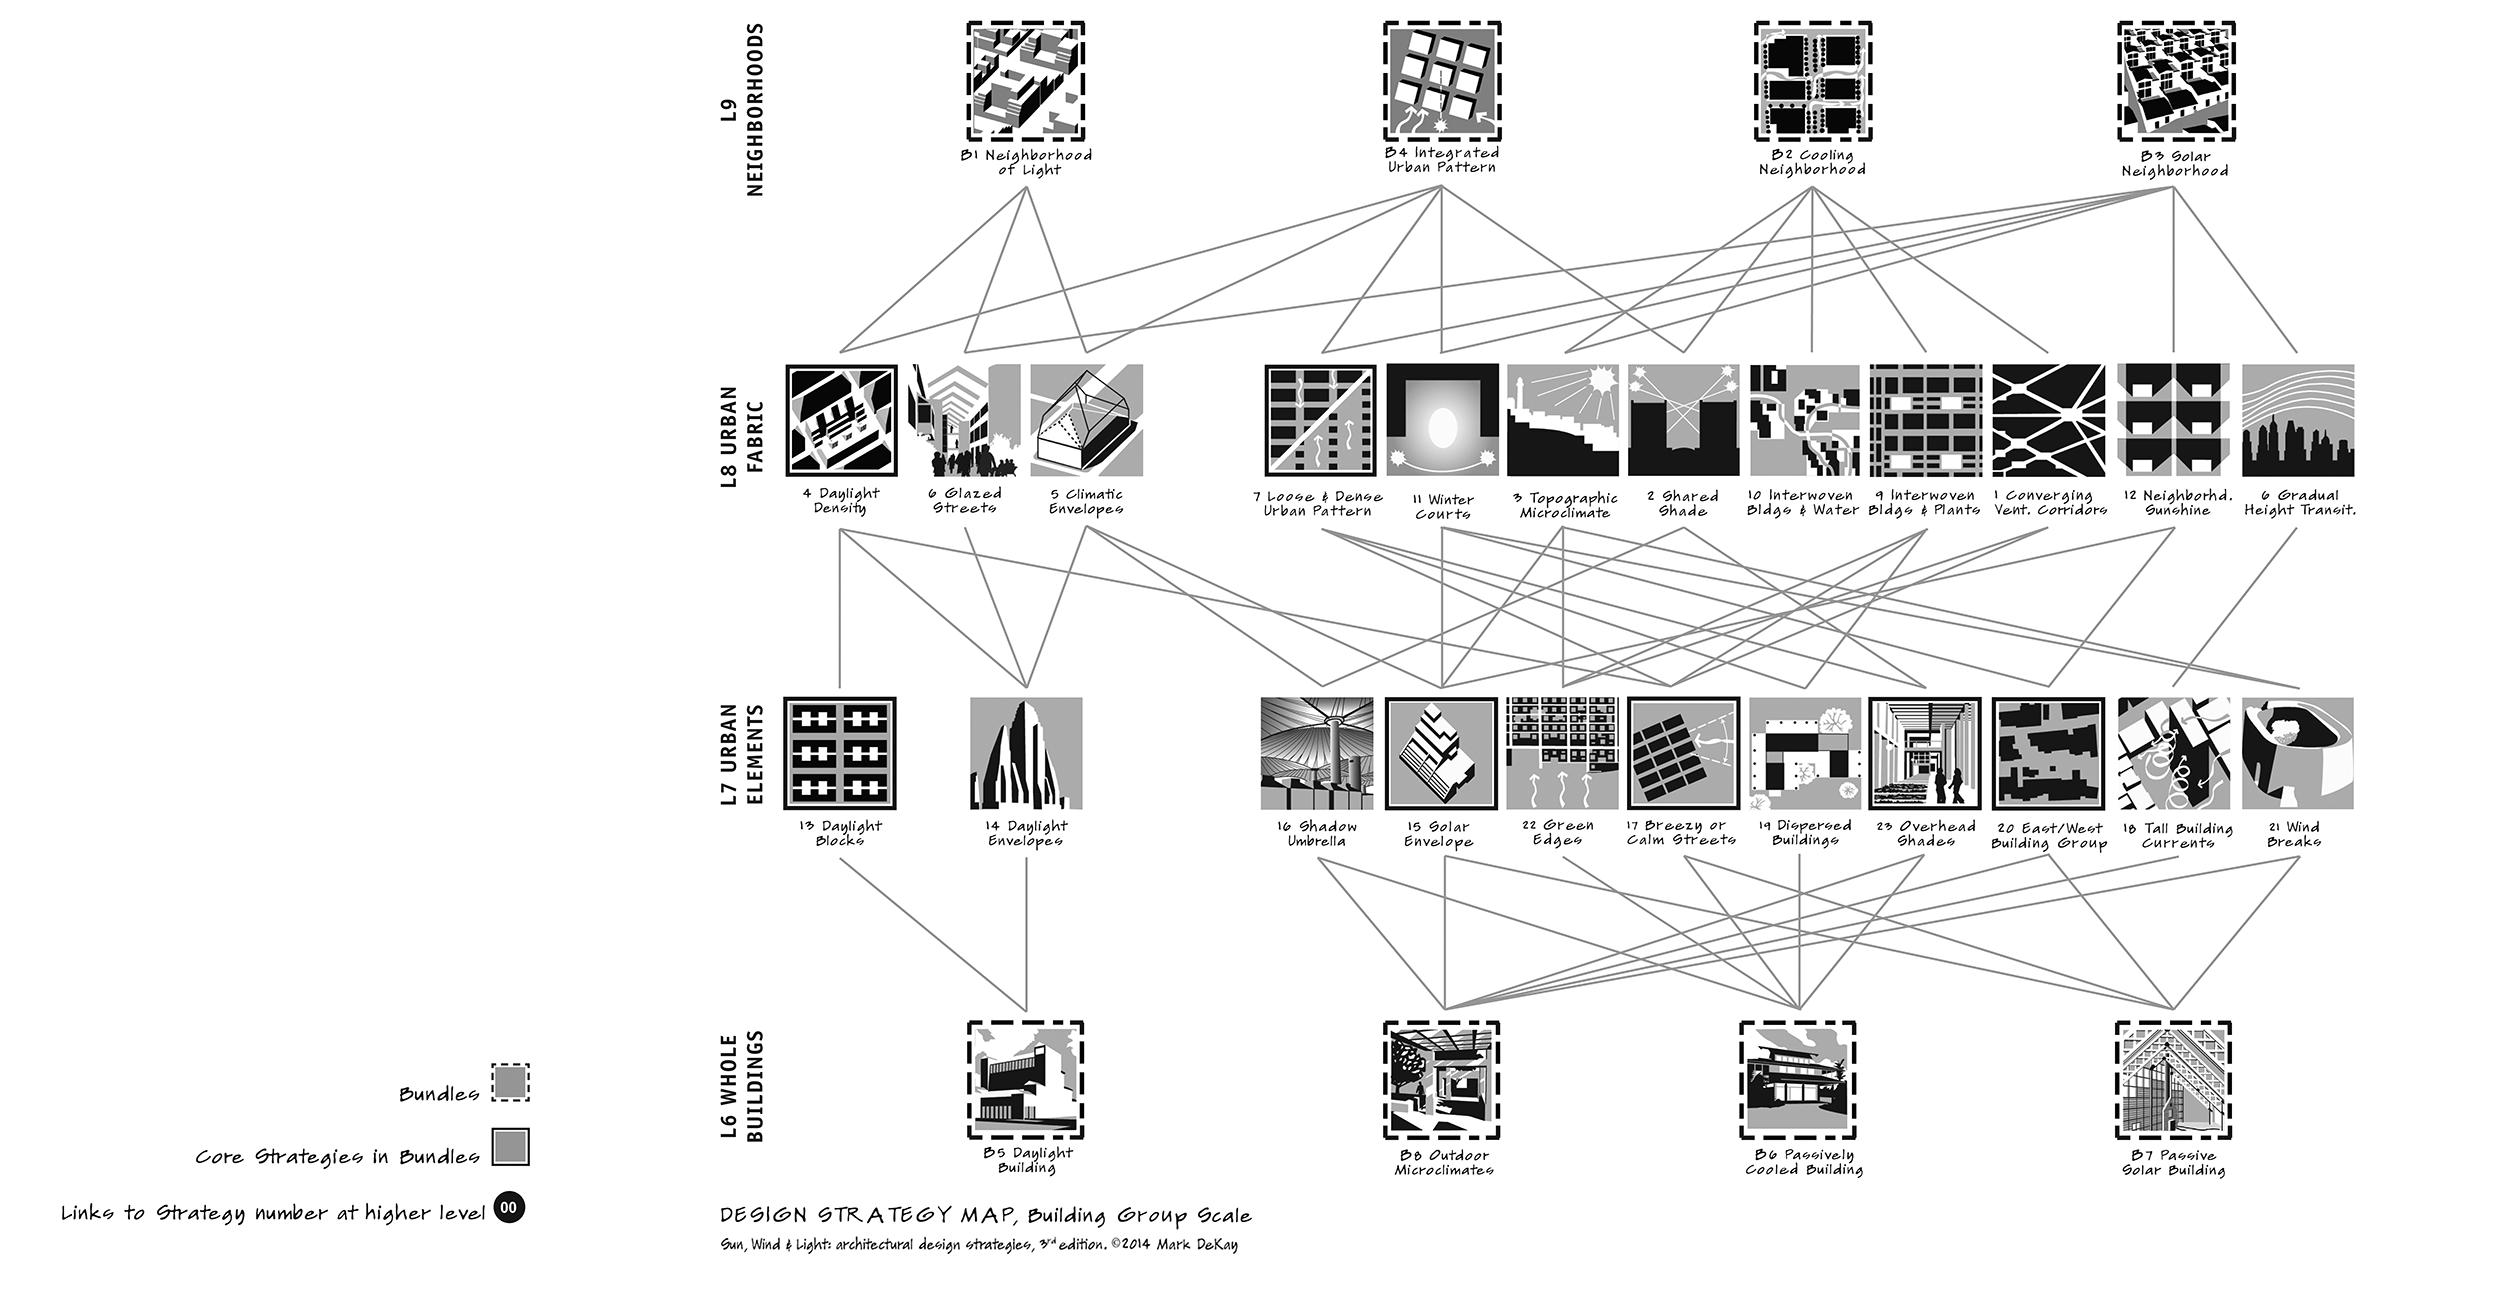 p32-3 Design Strategy Map: Bldg Groups